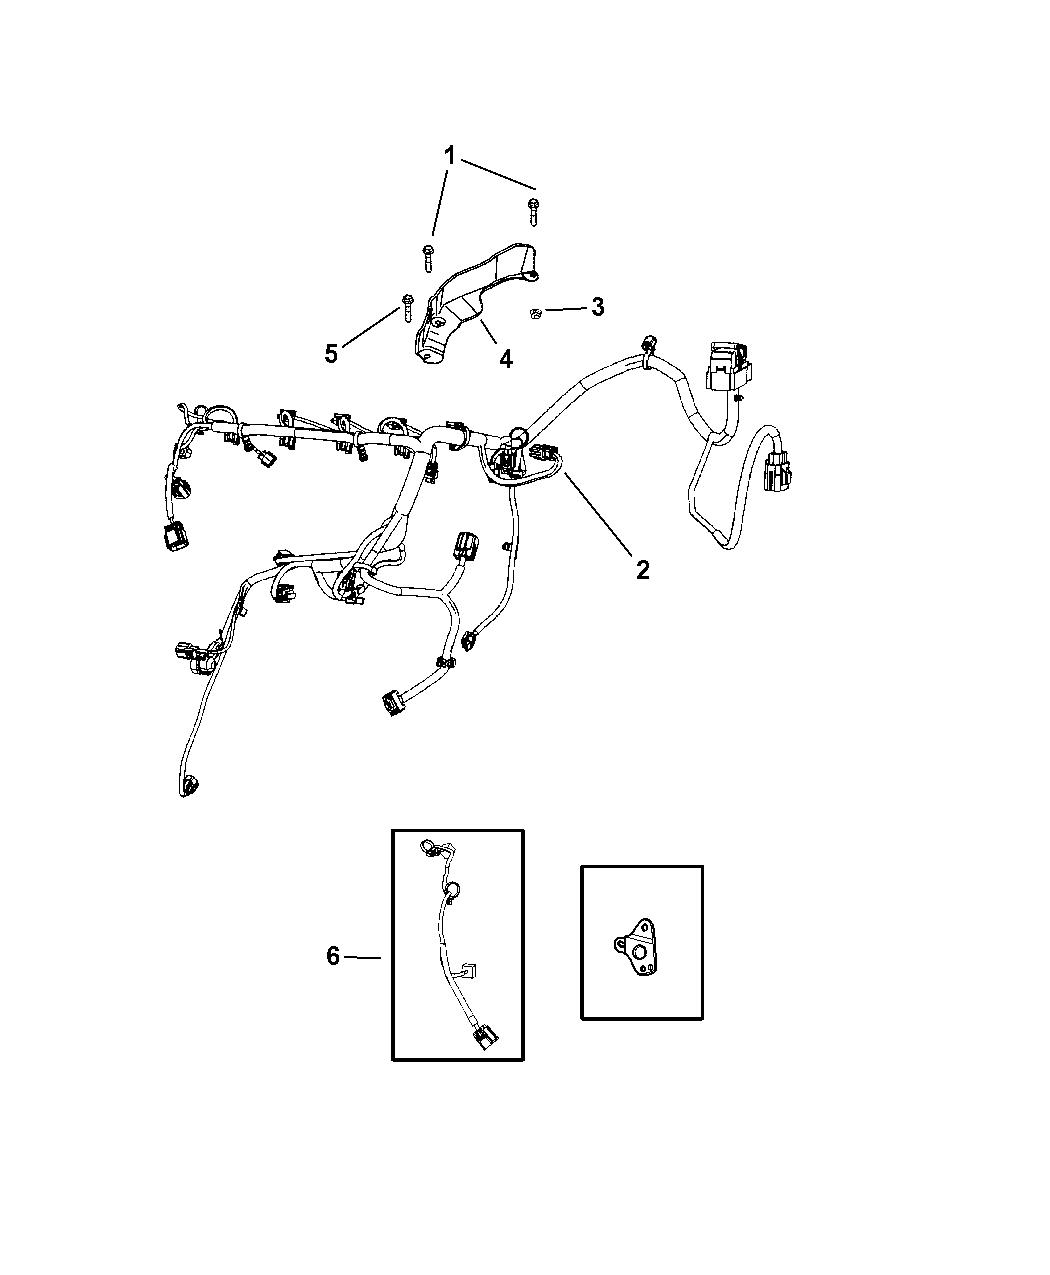 2007 Jeep Compass Wiring Powertrain Transmission Diagram